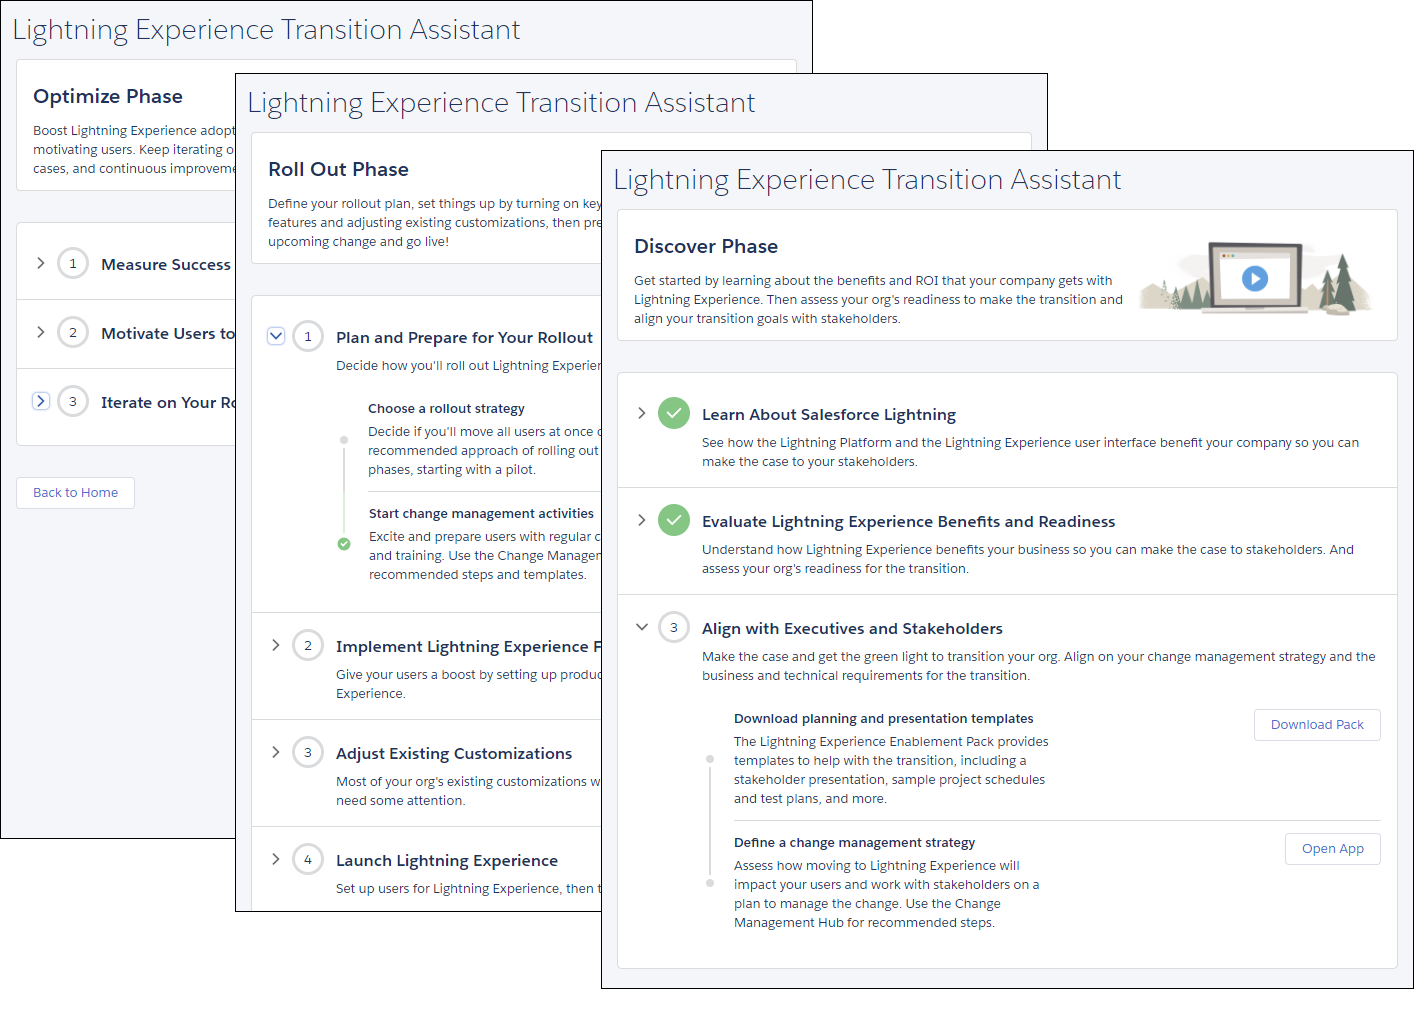 Lightning Experience 切り替えアシスタントの発見、ロールアウト、最適化フェーズページのスクリーンショット